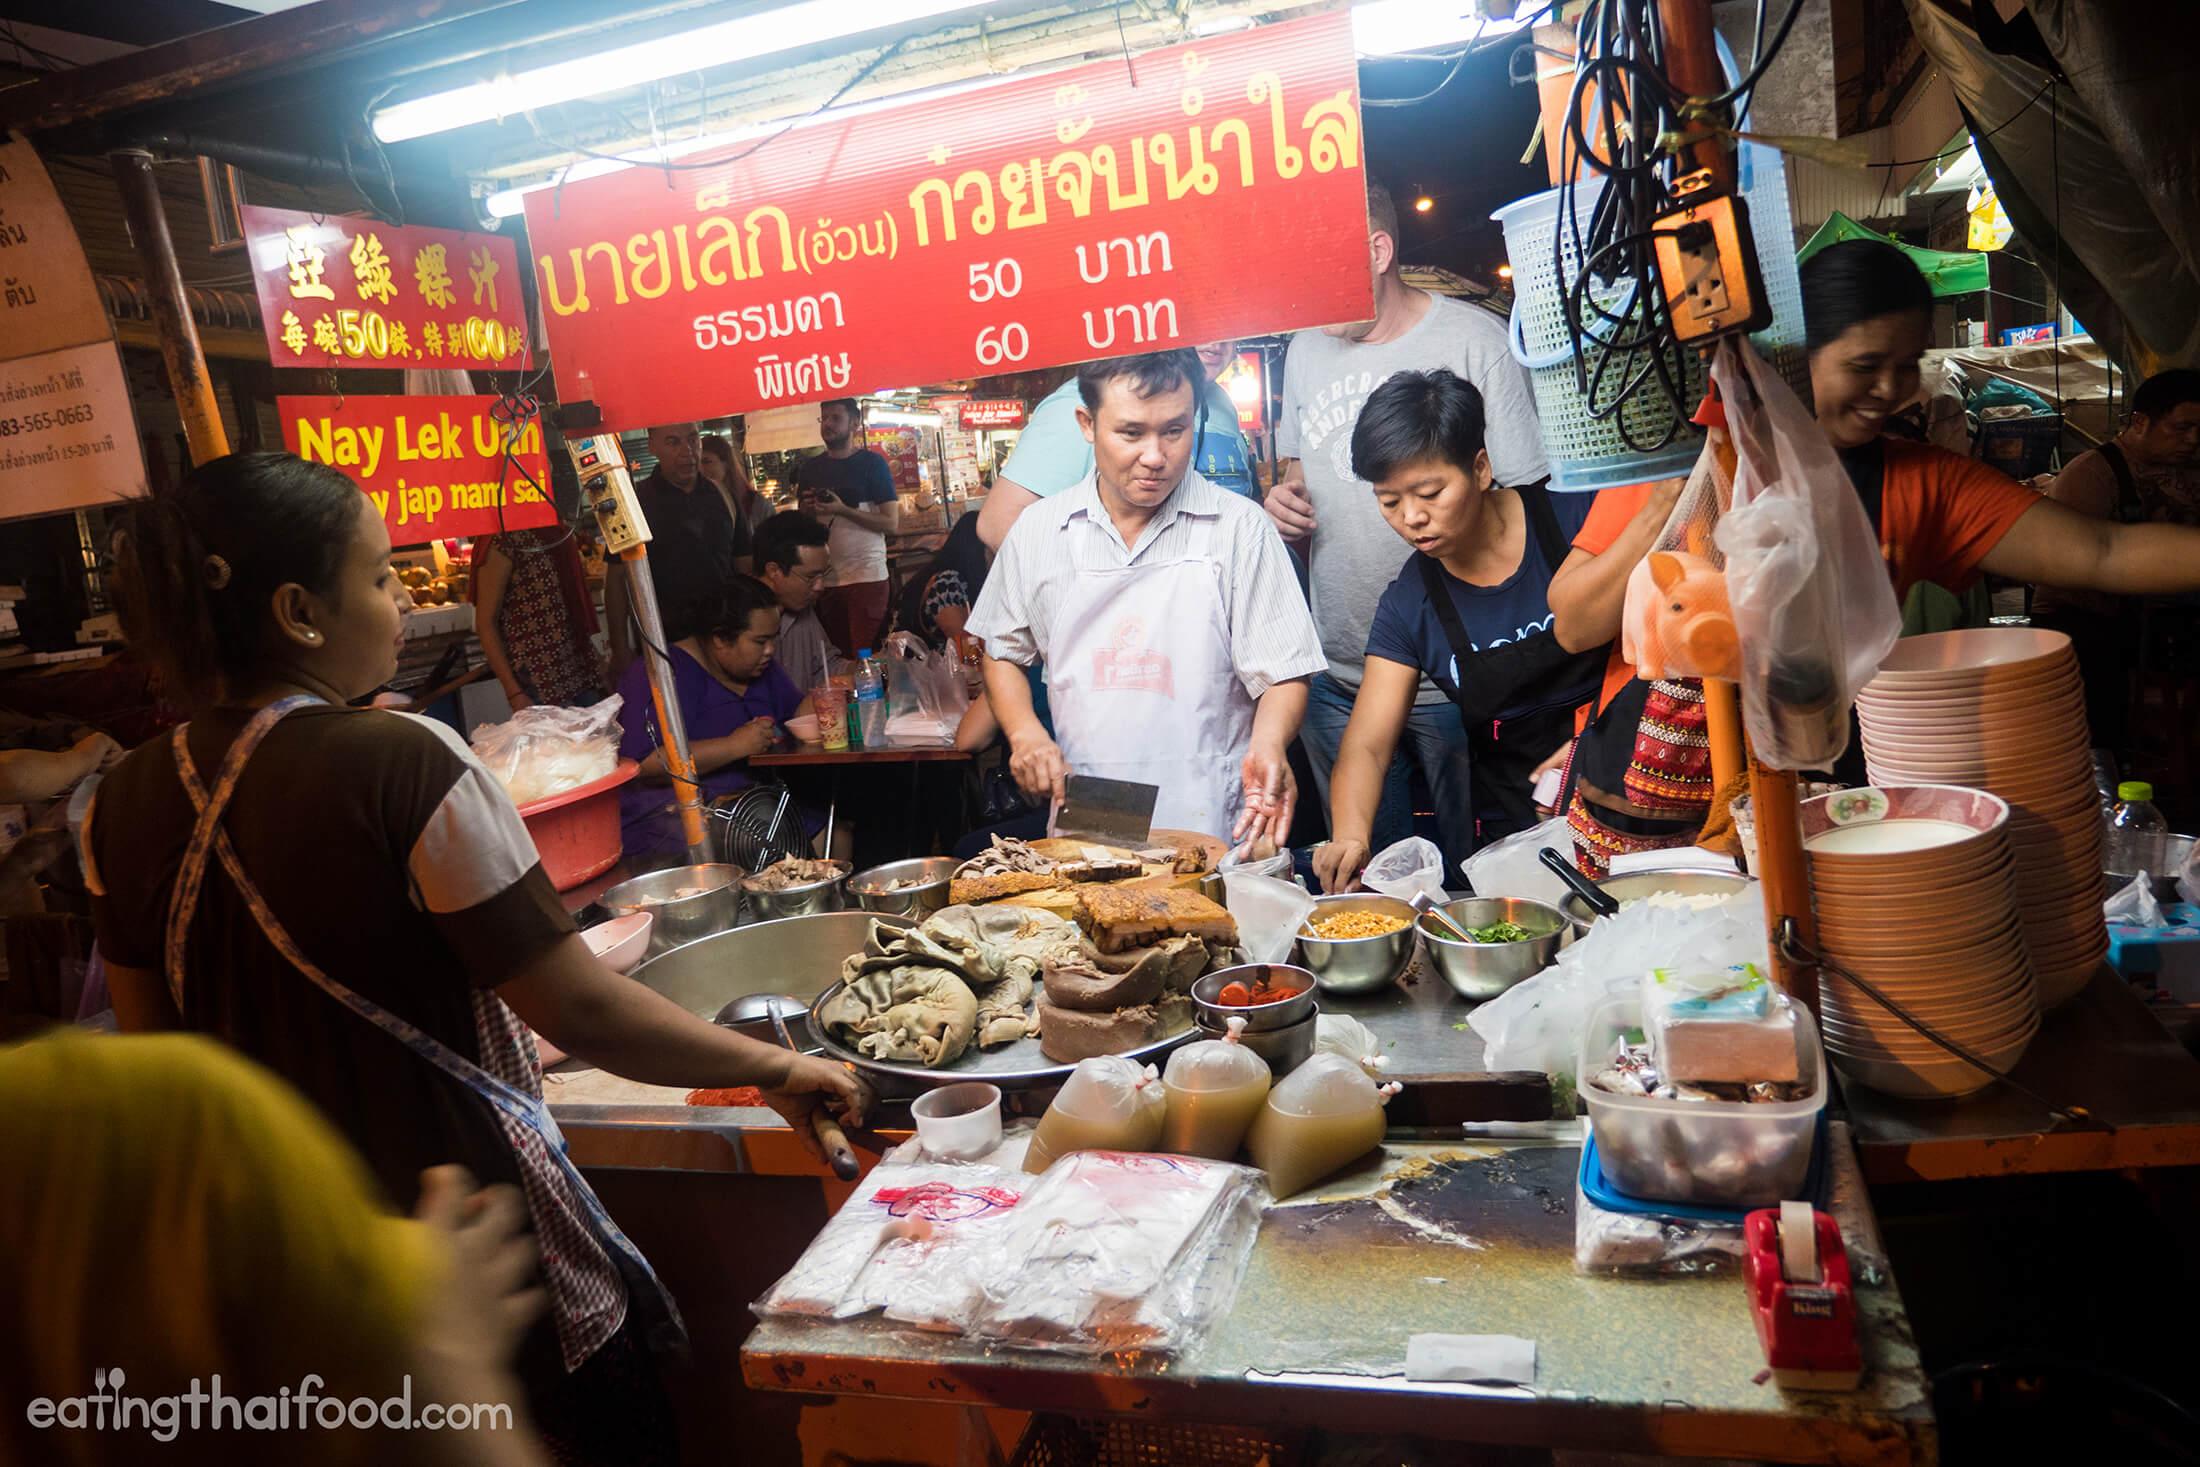 Peppery Soup and Crispy Pork: Kuay Jab Nay Lek (ก๋วยจั๊บนายเล็ก)